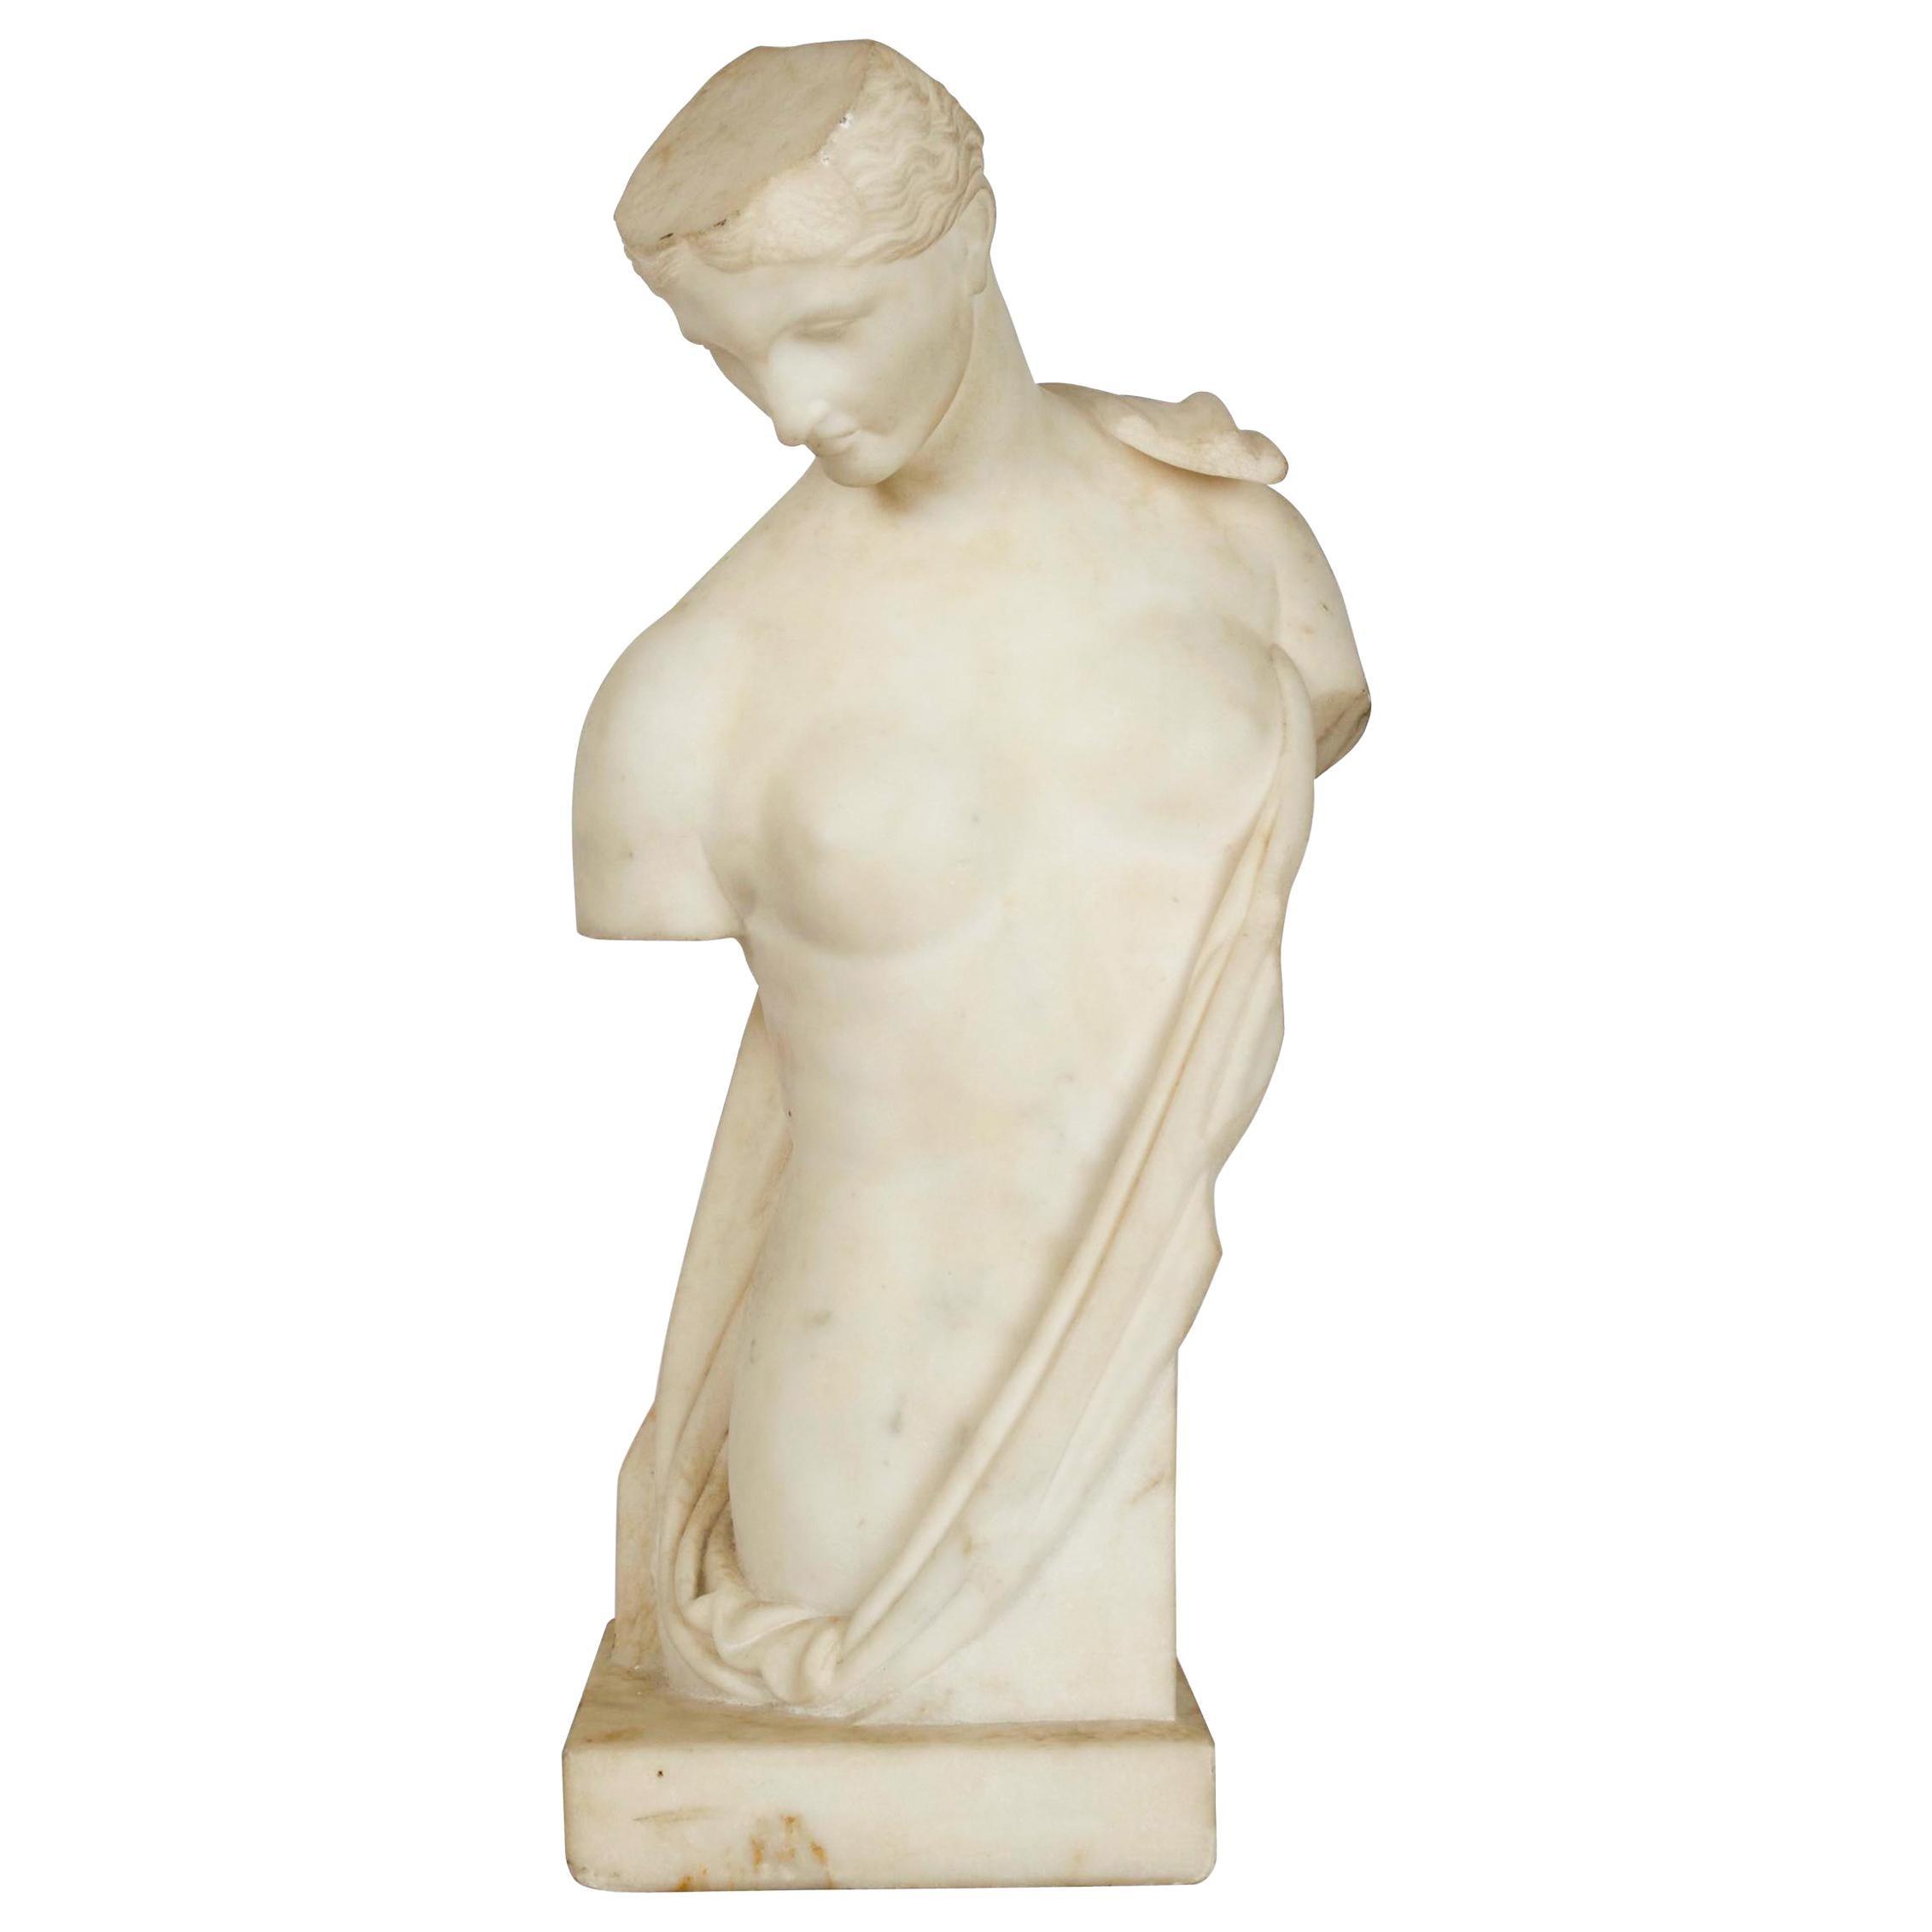 "Italian Antique Marble Bust Sculpture ""Psyche of Capua"", 19th Century"